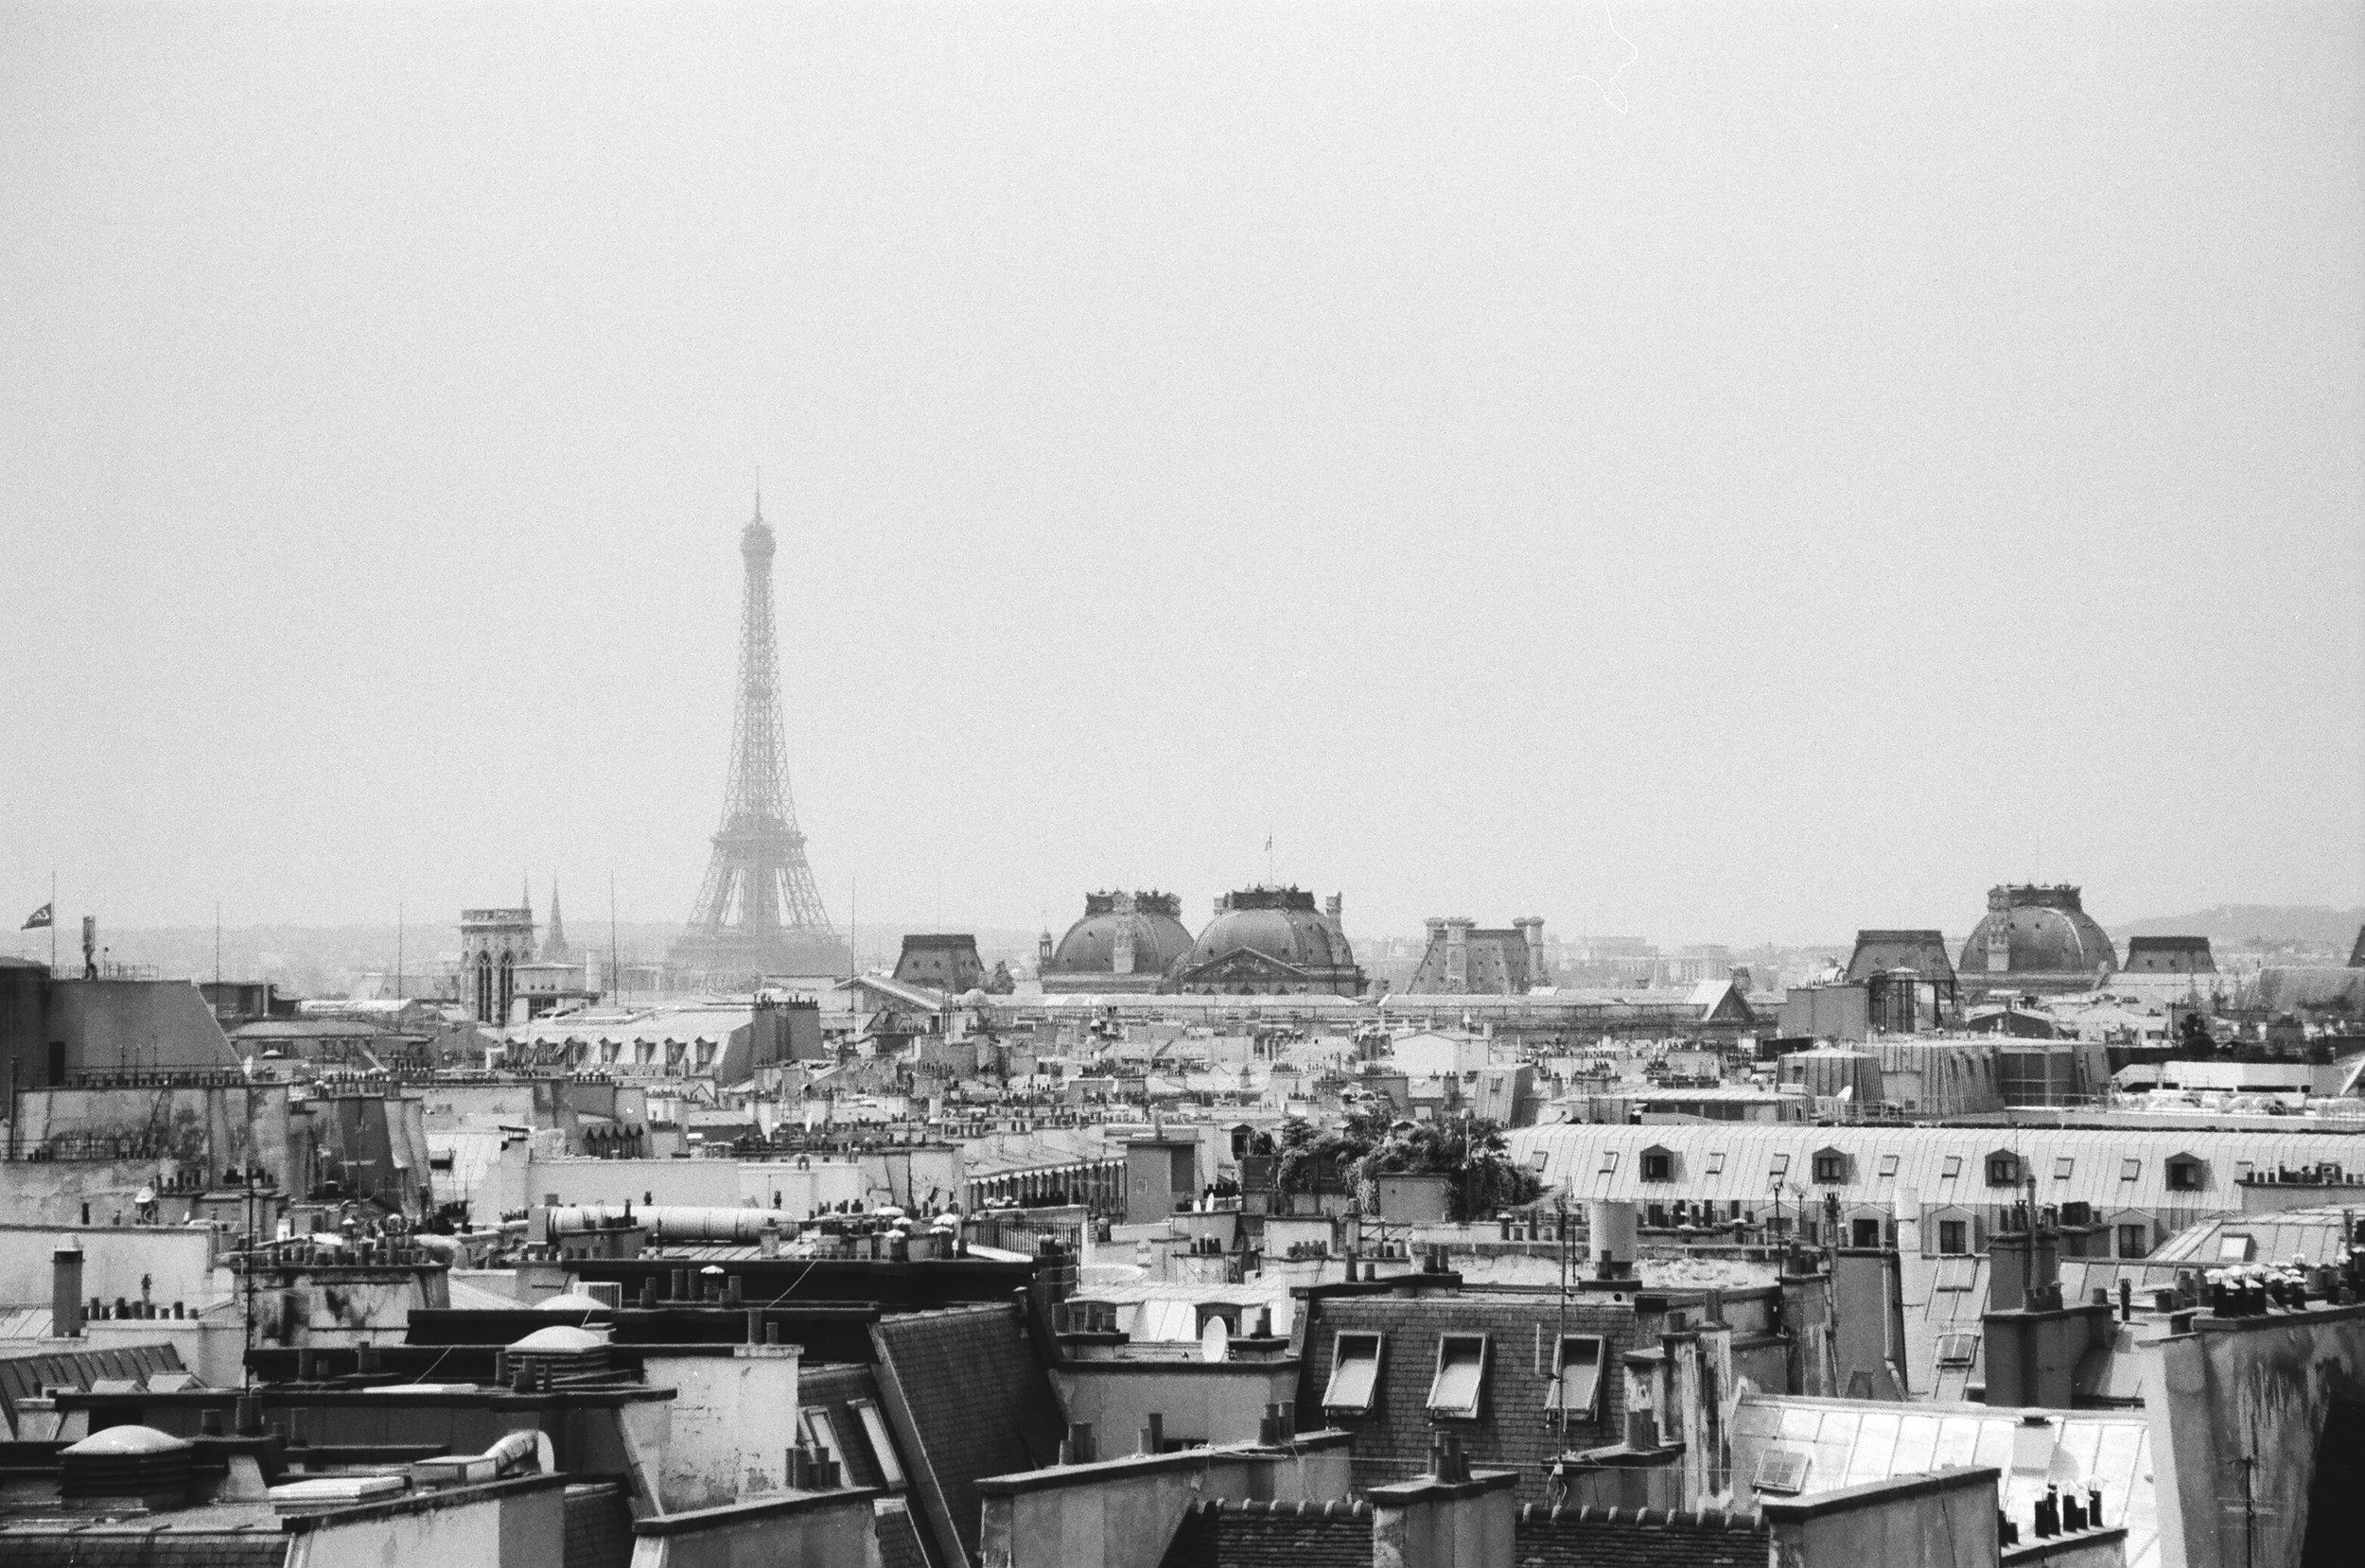 paris_cityscape_by_jeremiah_alley.jpg